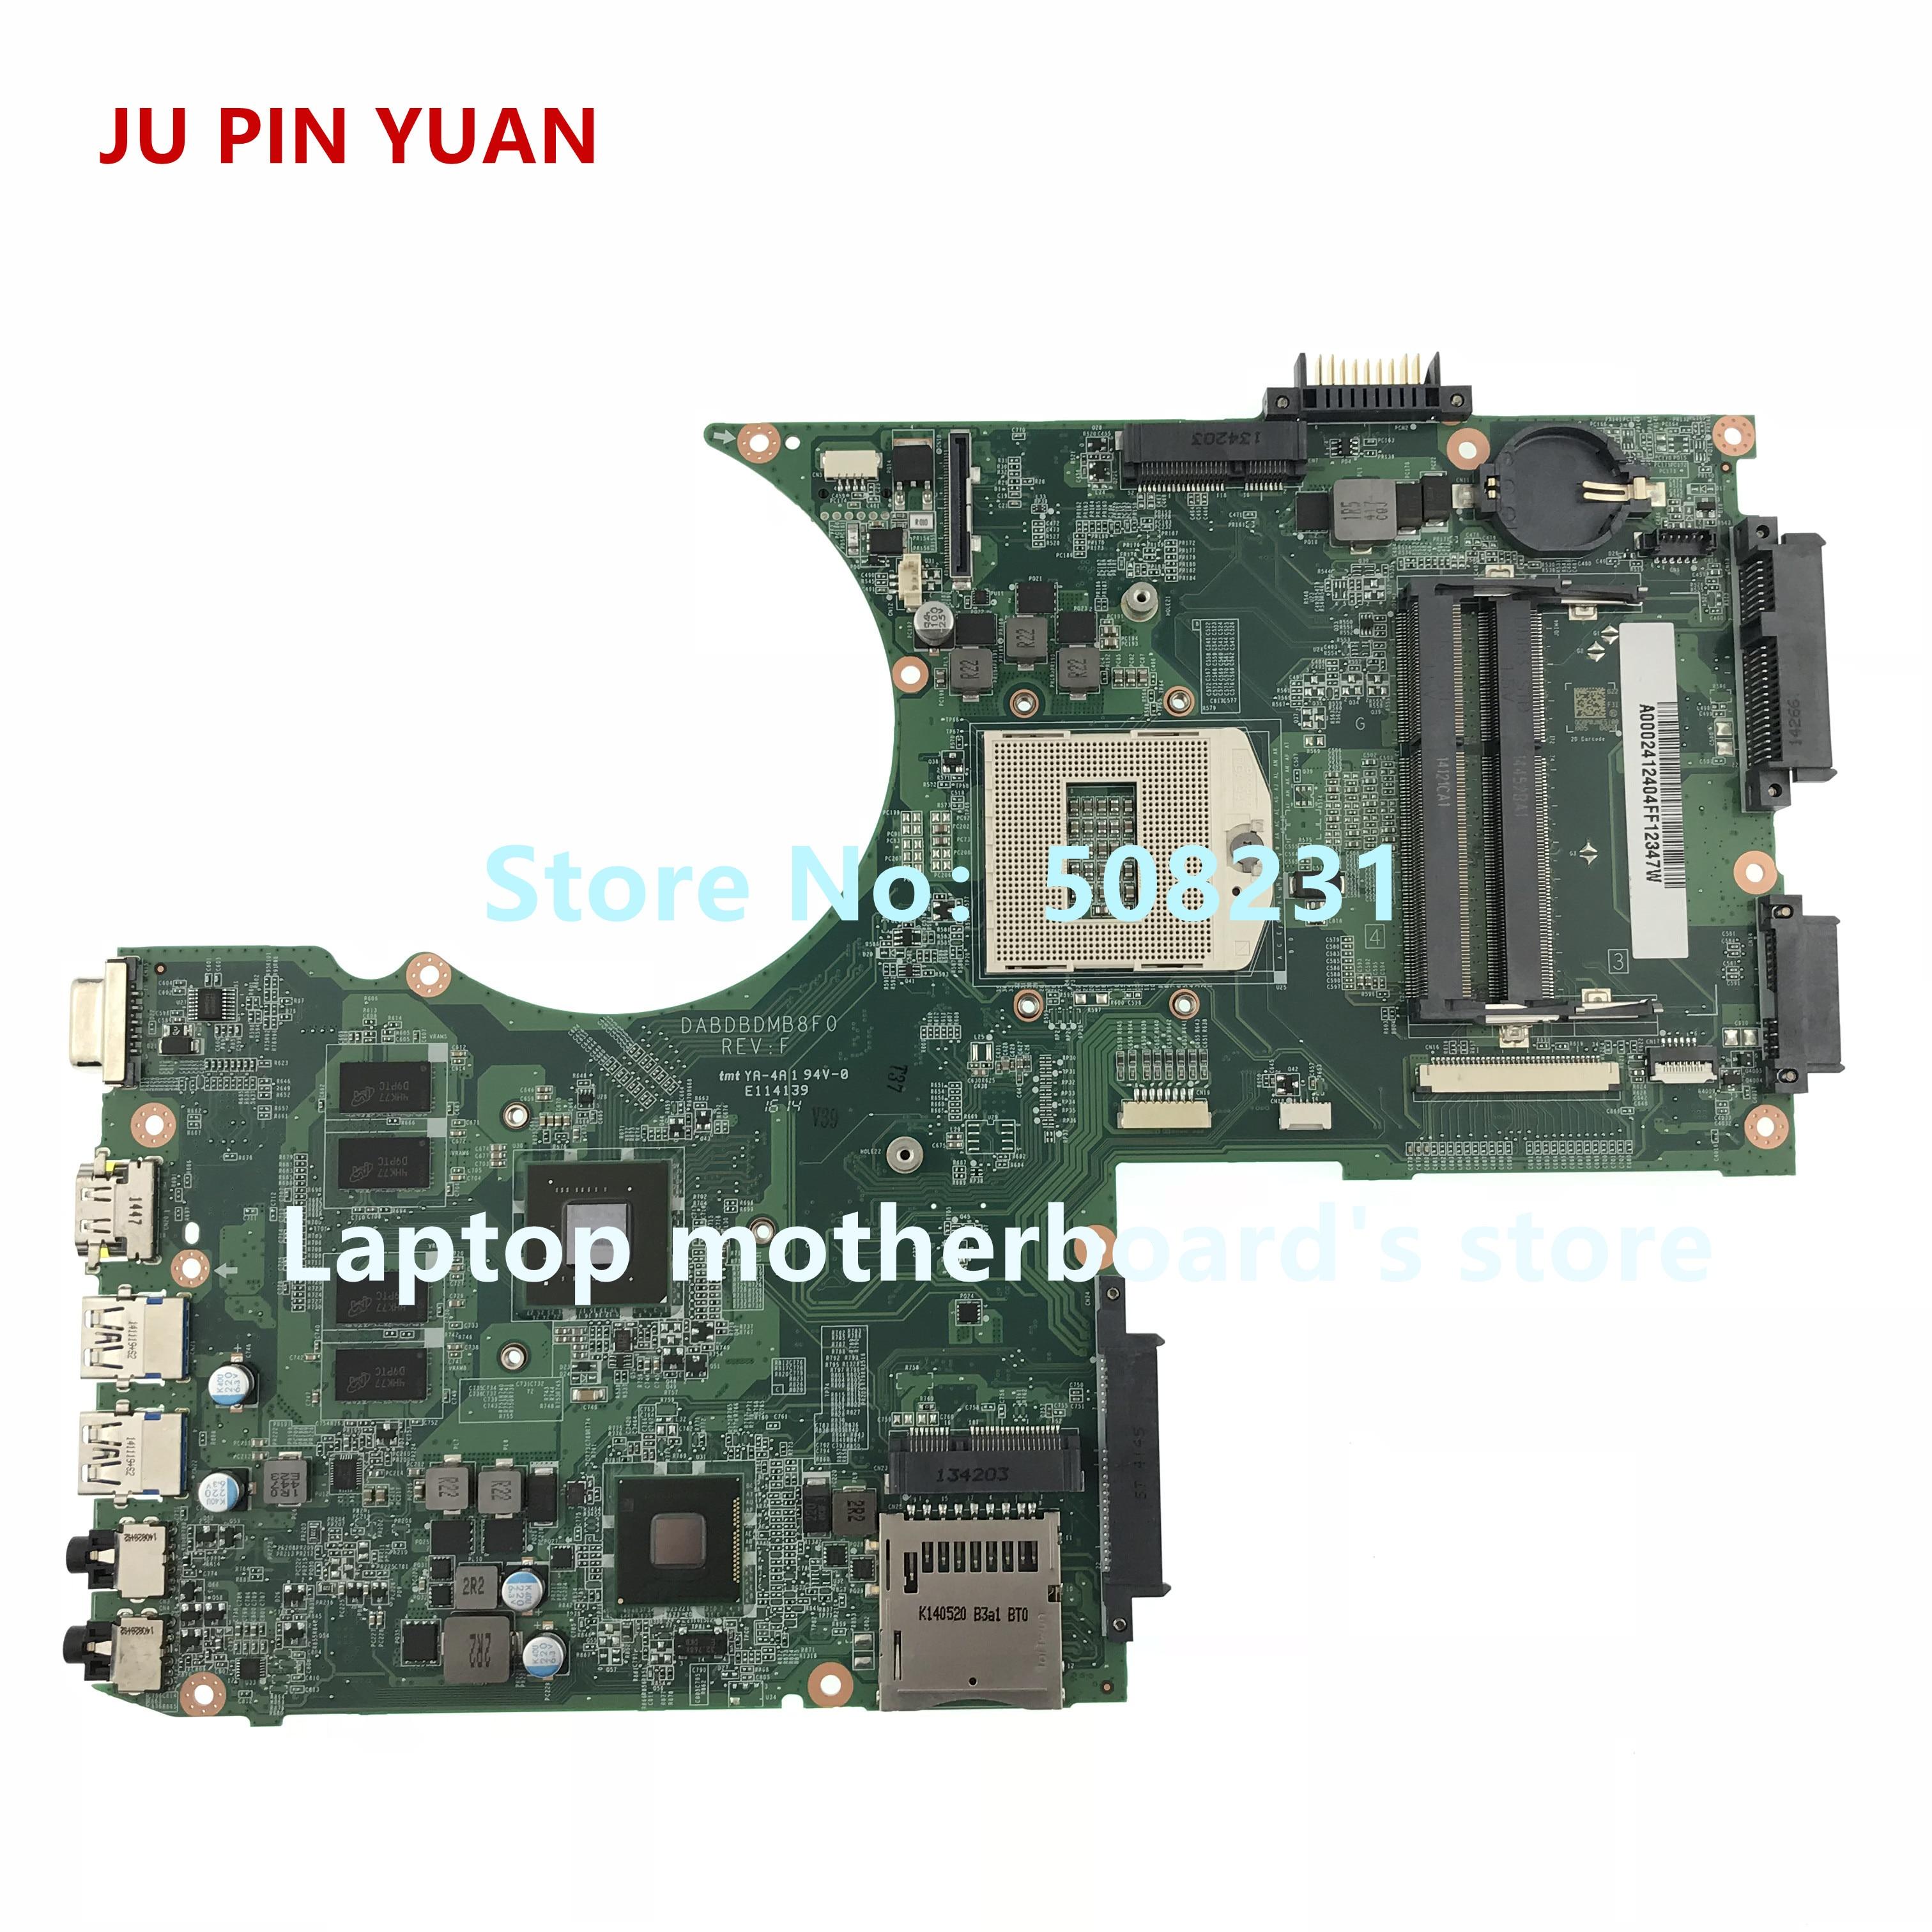 Computer & Büro Ju Pin Yuan Für Toshiba Satellite P70 P75 P70-a P75-a Laptop Motherboard Dabdbdmb8f0 Mit Gt740m 2 Gb Sockel Pga 947 Laptop Motherboard